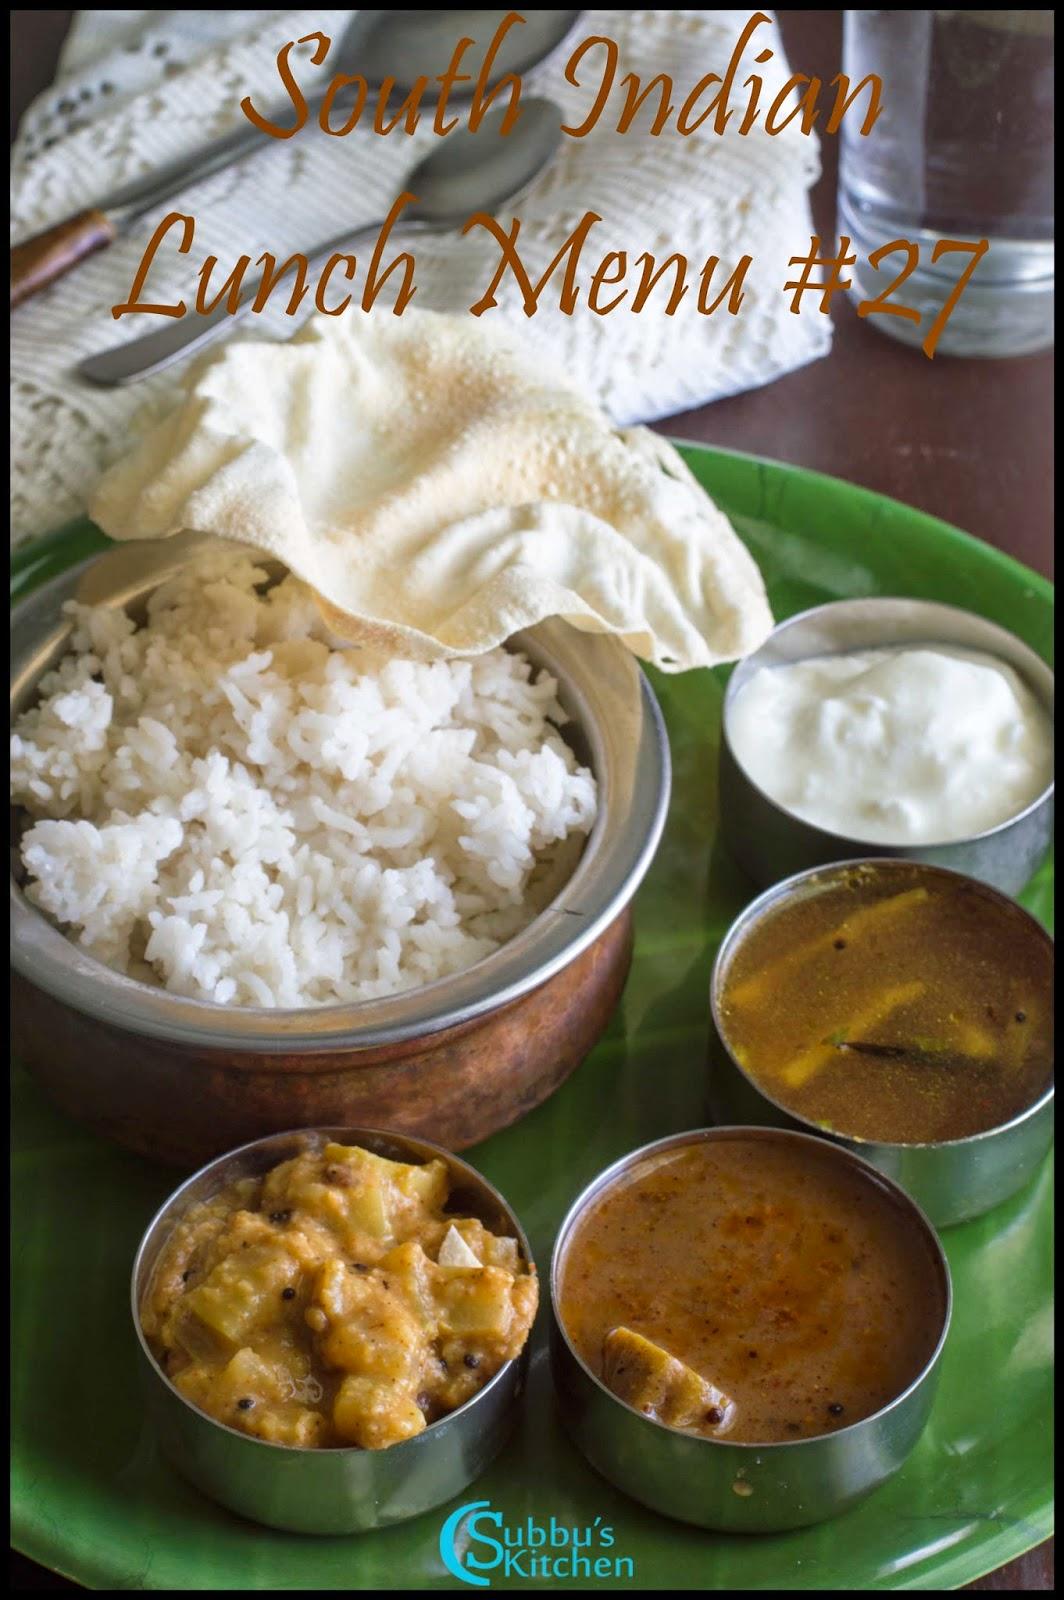 South Indian Lunch Menu 27 - Omam Vendhaya Kuzhambu, Chow Chow kootu, Brinjal Rasam, Rice and Papad